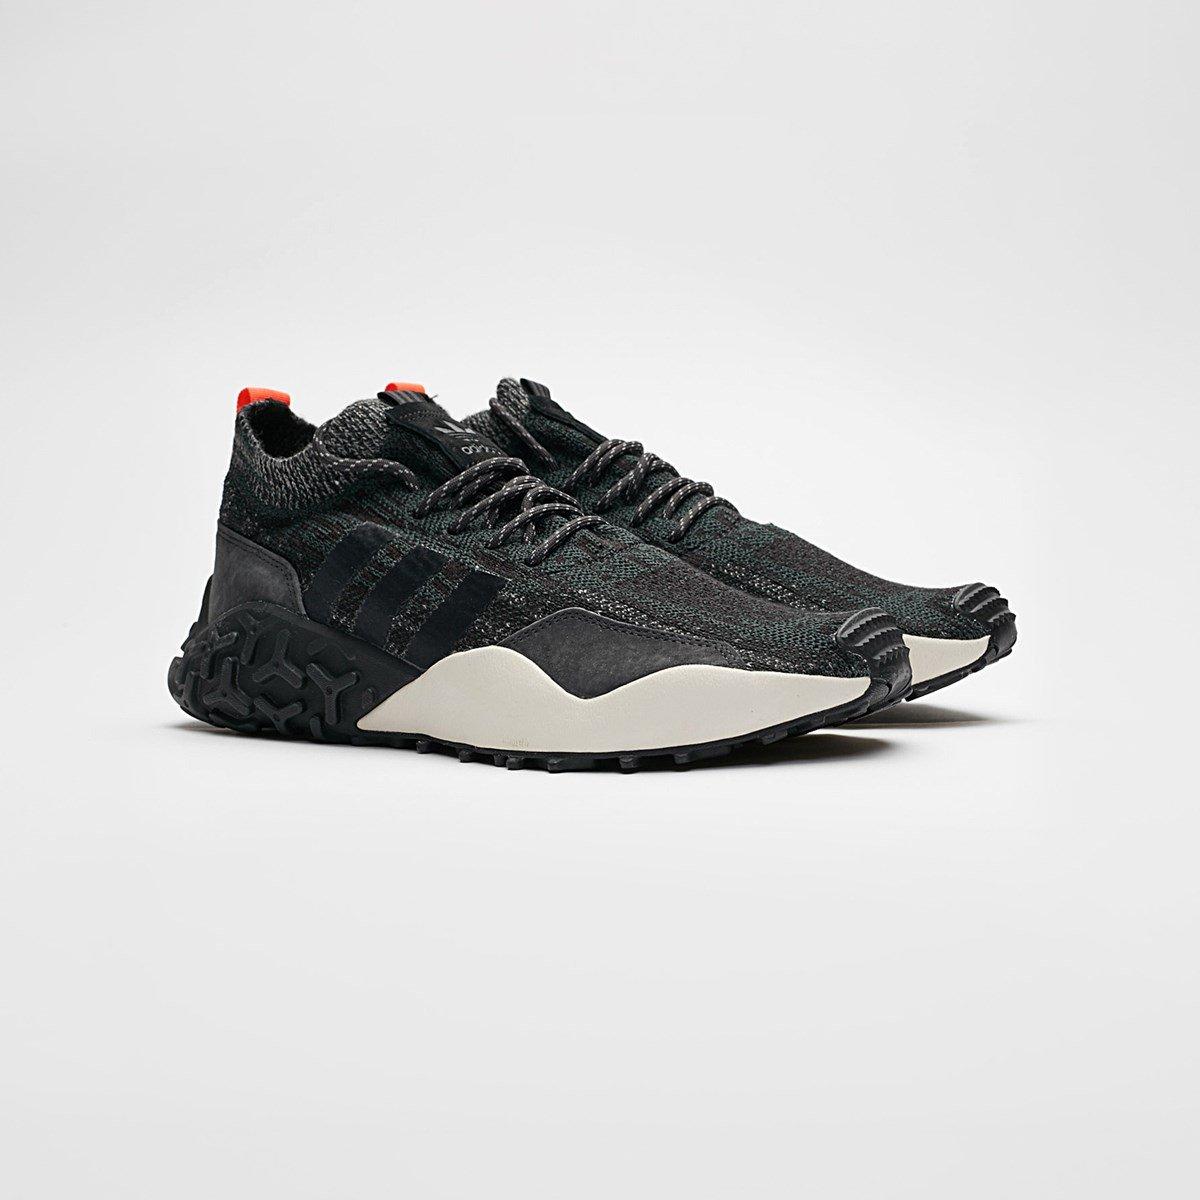 heiß adidas F2 TR PK Aq1109 Sneakersnstuff | sneakers & streetwear online since 1999  spare mehr